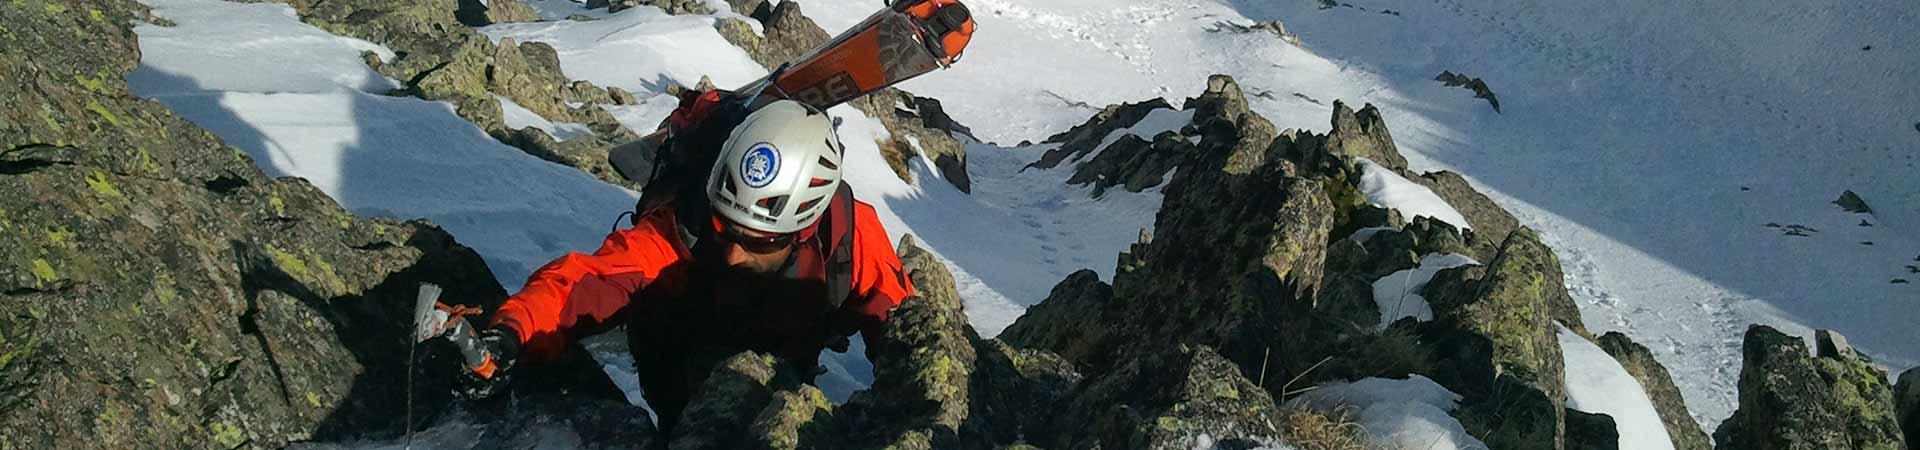 Sortides-Pràctiques-Alpinisme-nivell-3-avançat